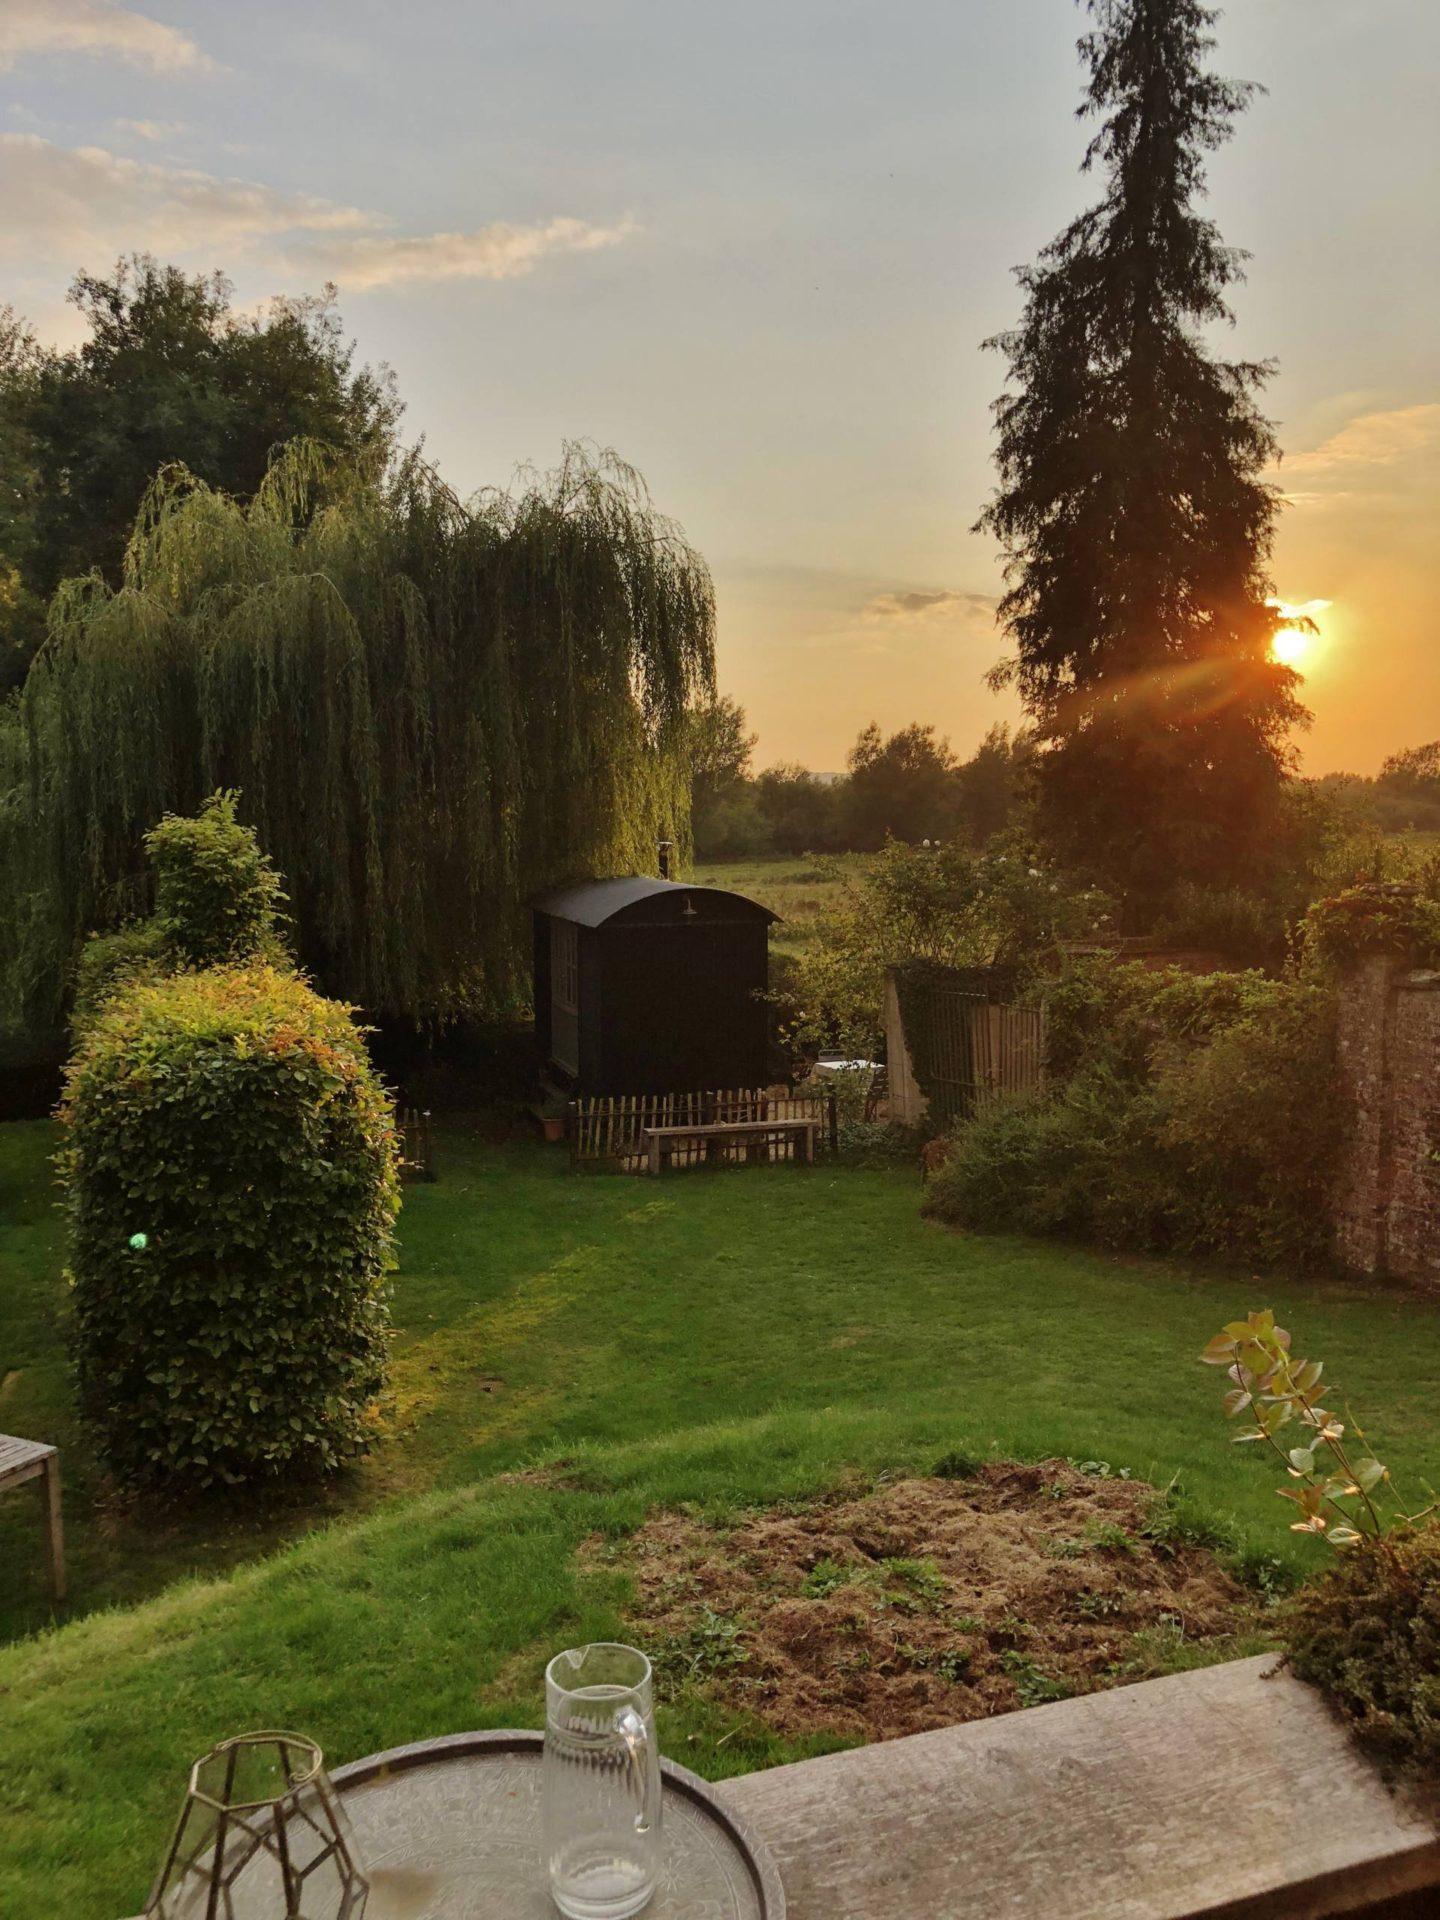 Shepherd's Hut Salisbury Sunset Getaway